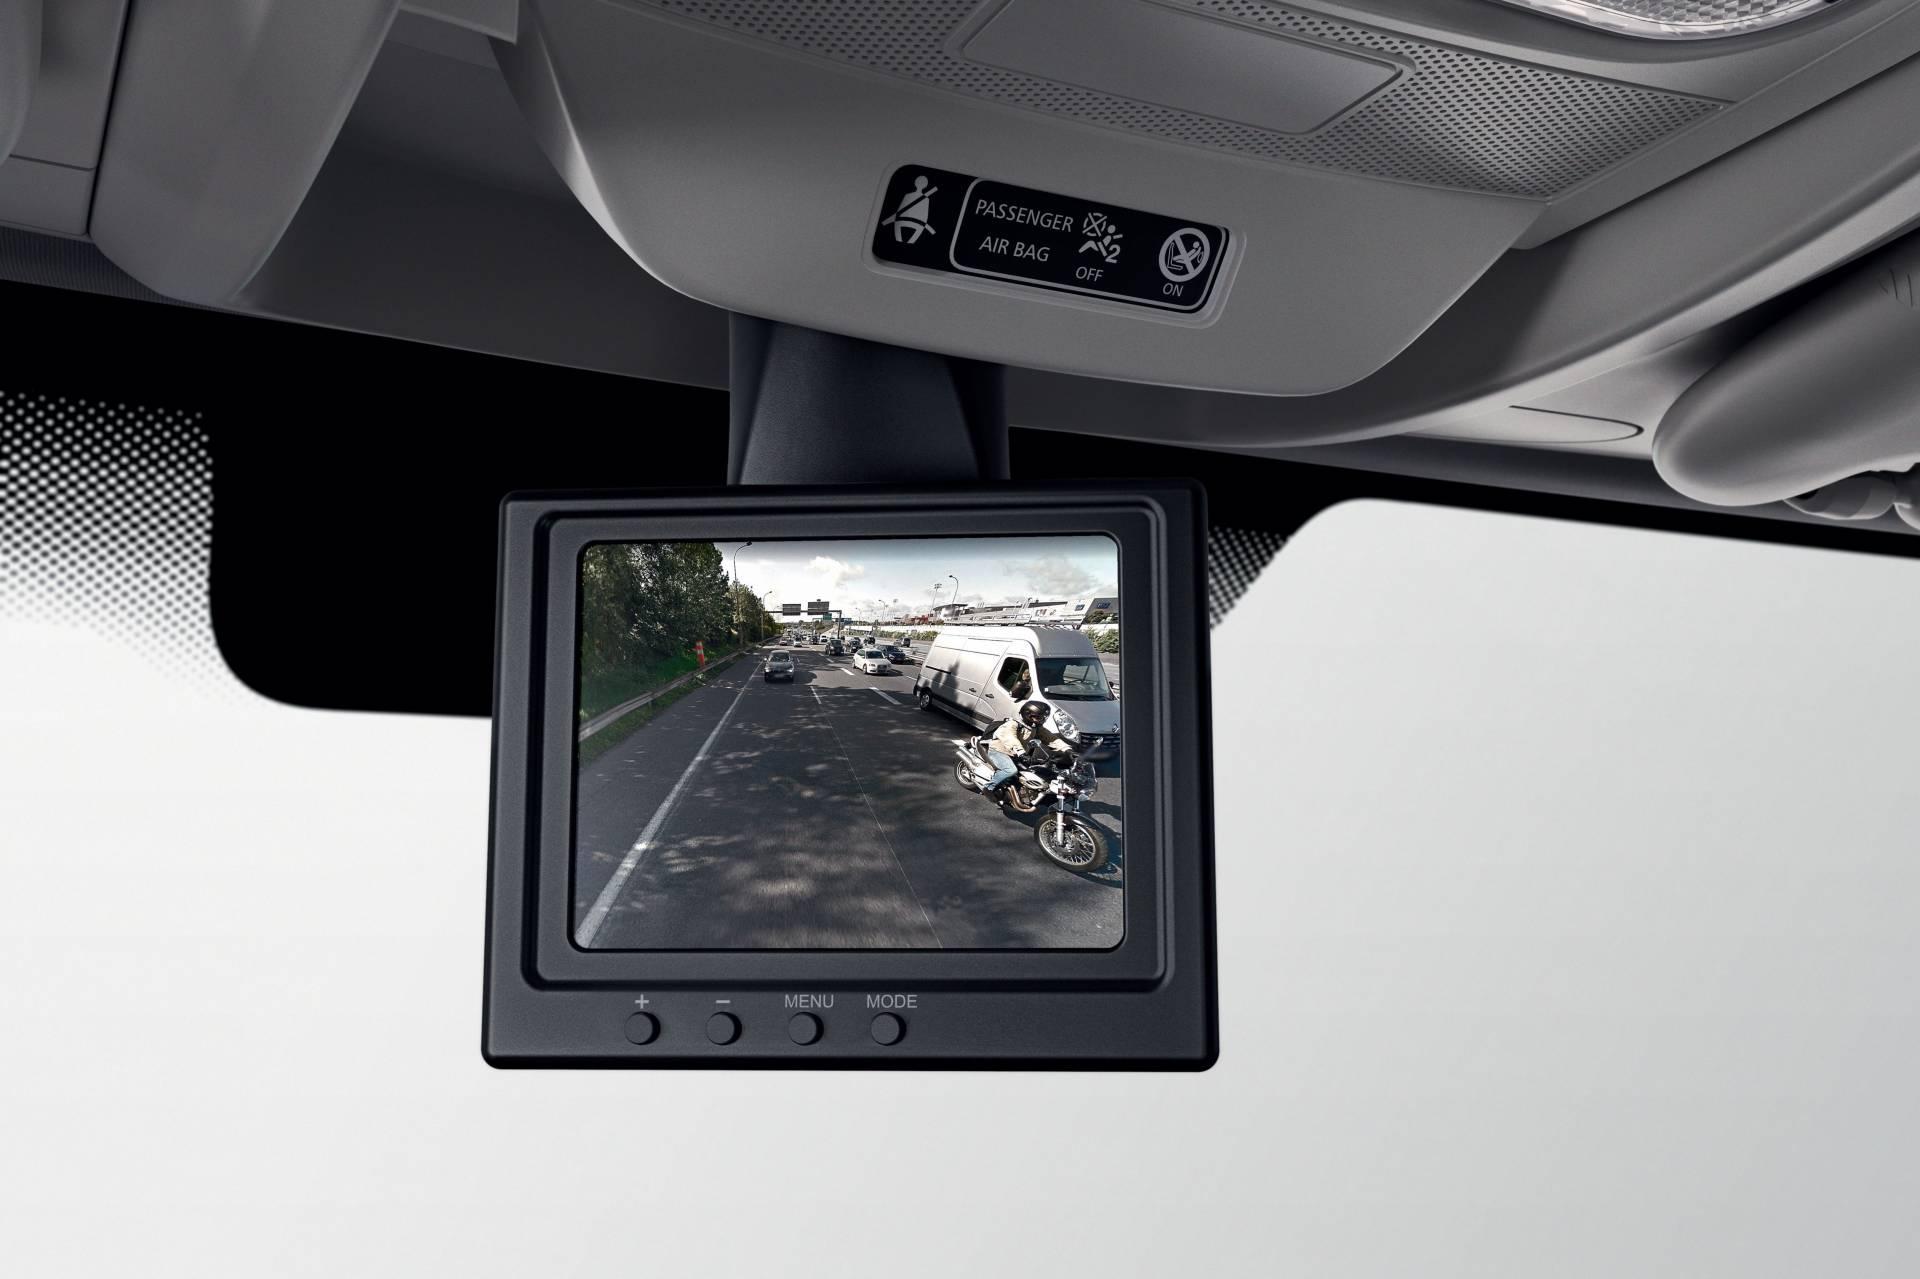 712601a4-2019my-renault-master-van-facelift-2